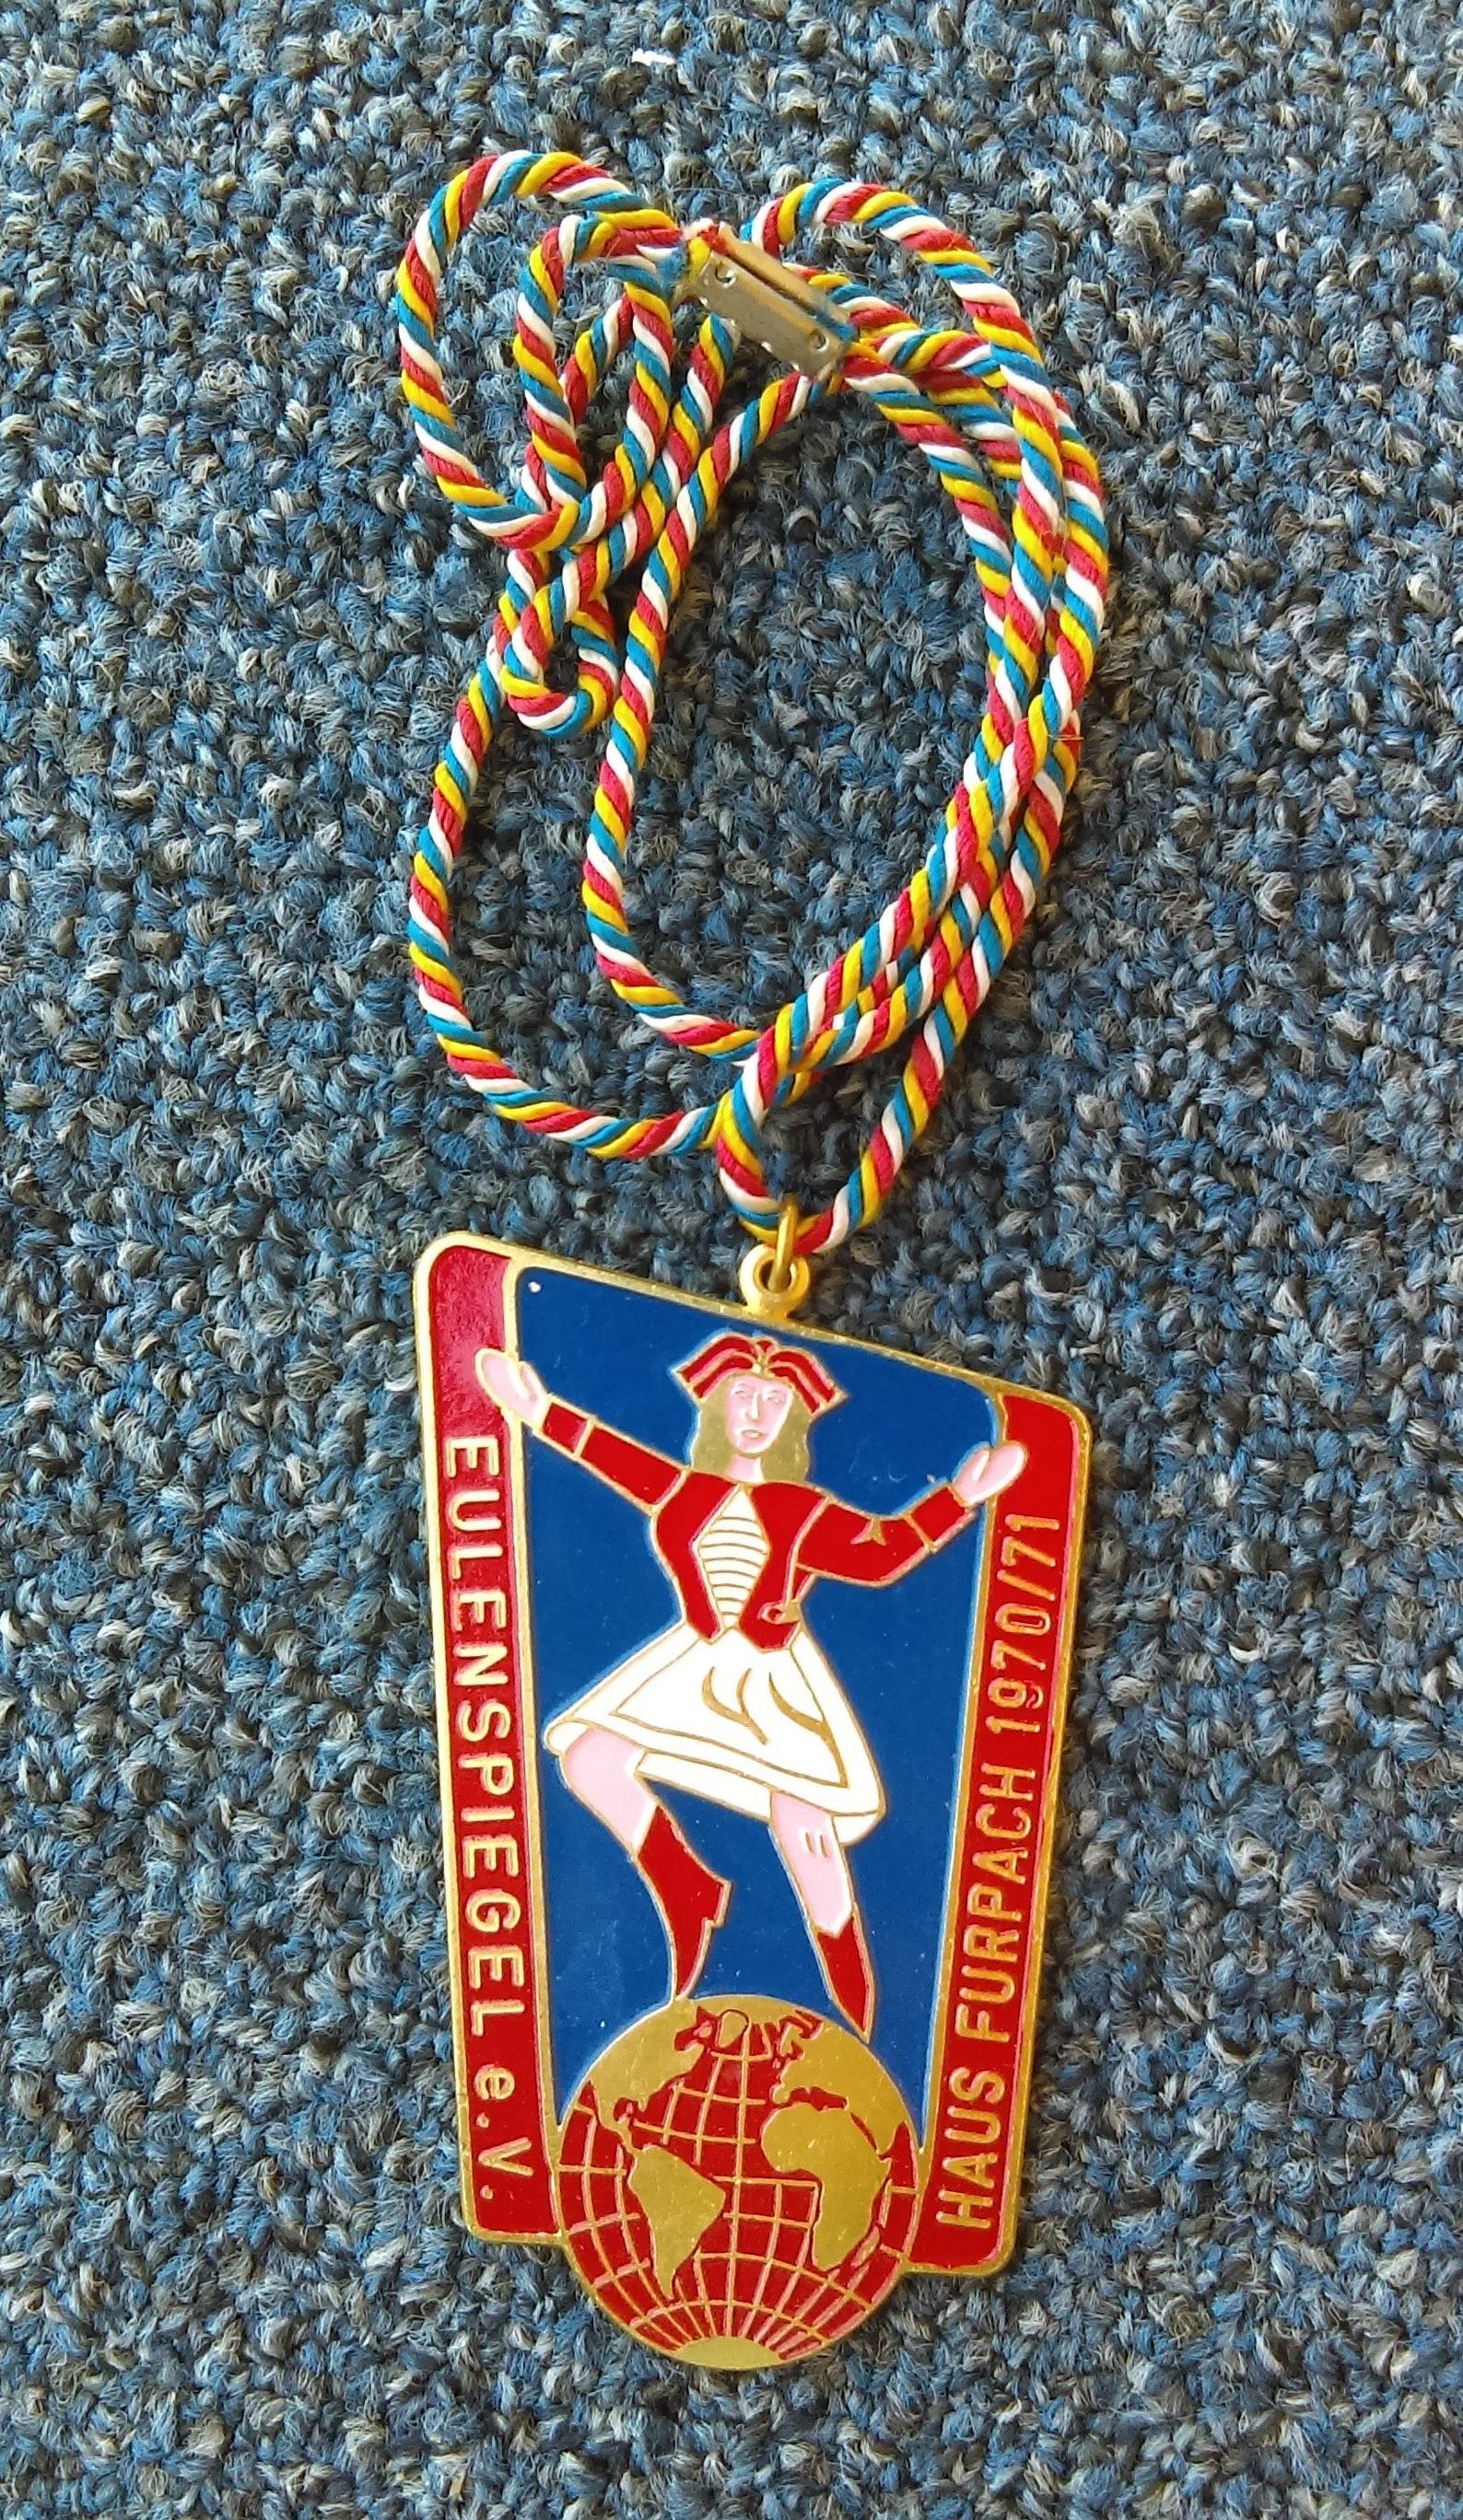 Carnival, Karnevalsverein Eulenspiegel Haus Furpach 1970 /71. Germany medal